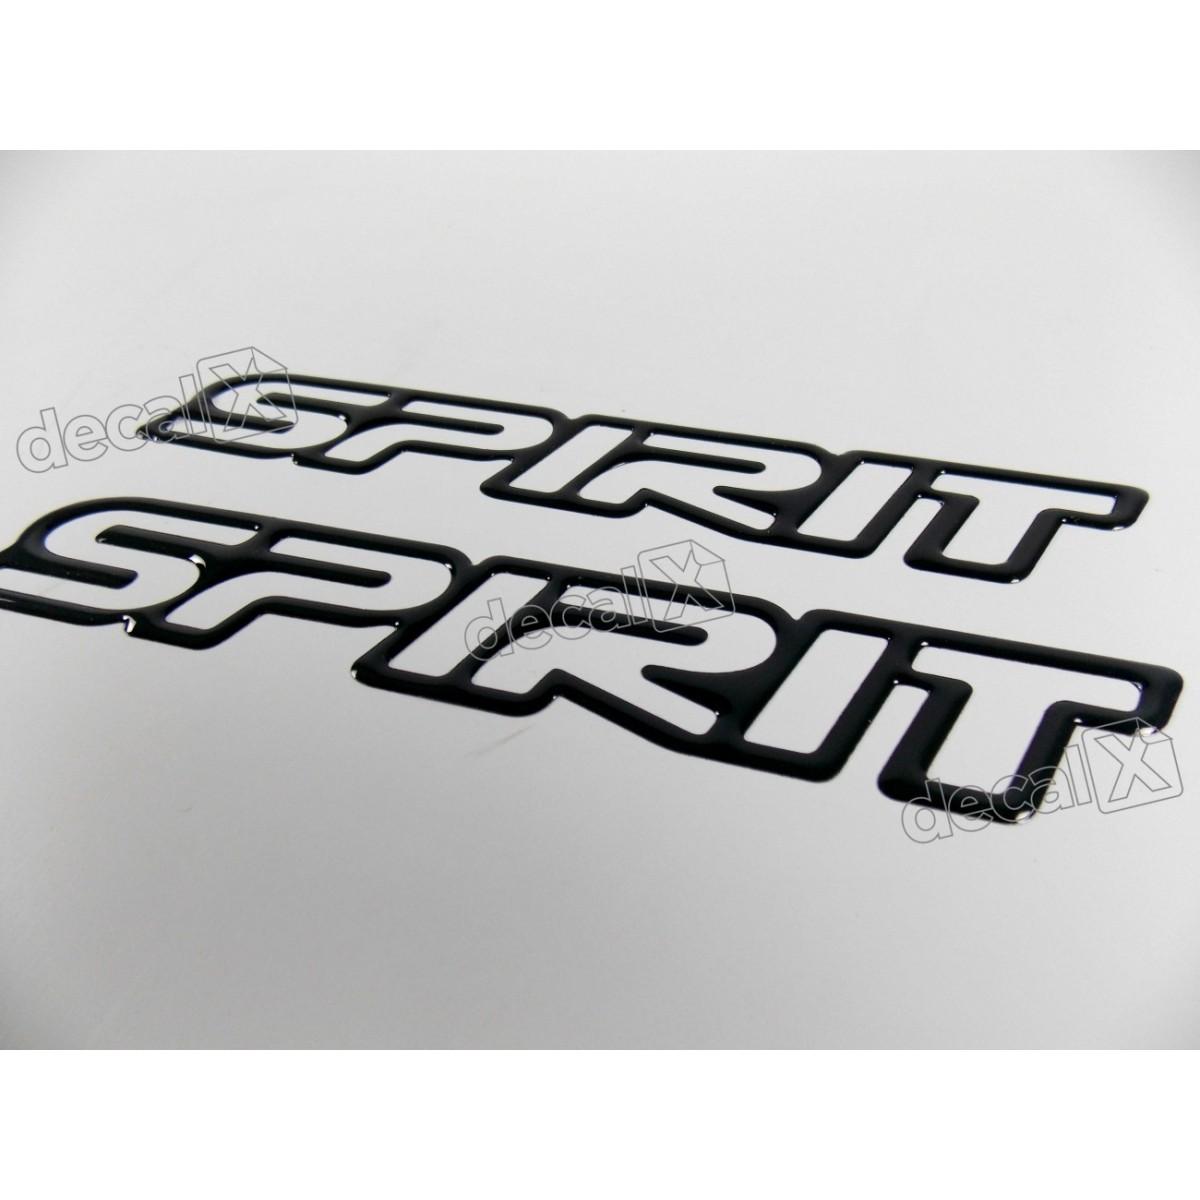 Adesivo Emblema Spirit Celta Classic Corsa Resinado Preto